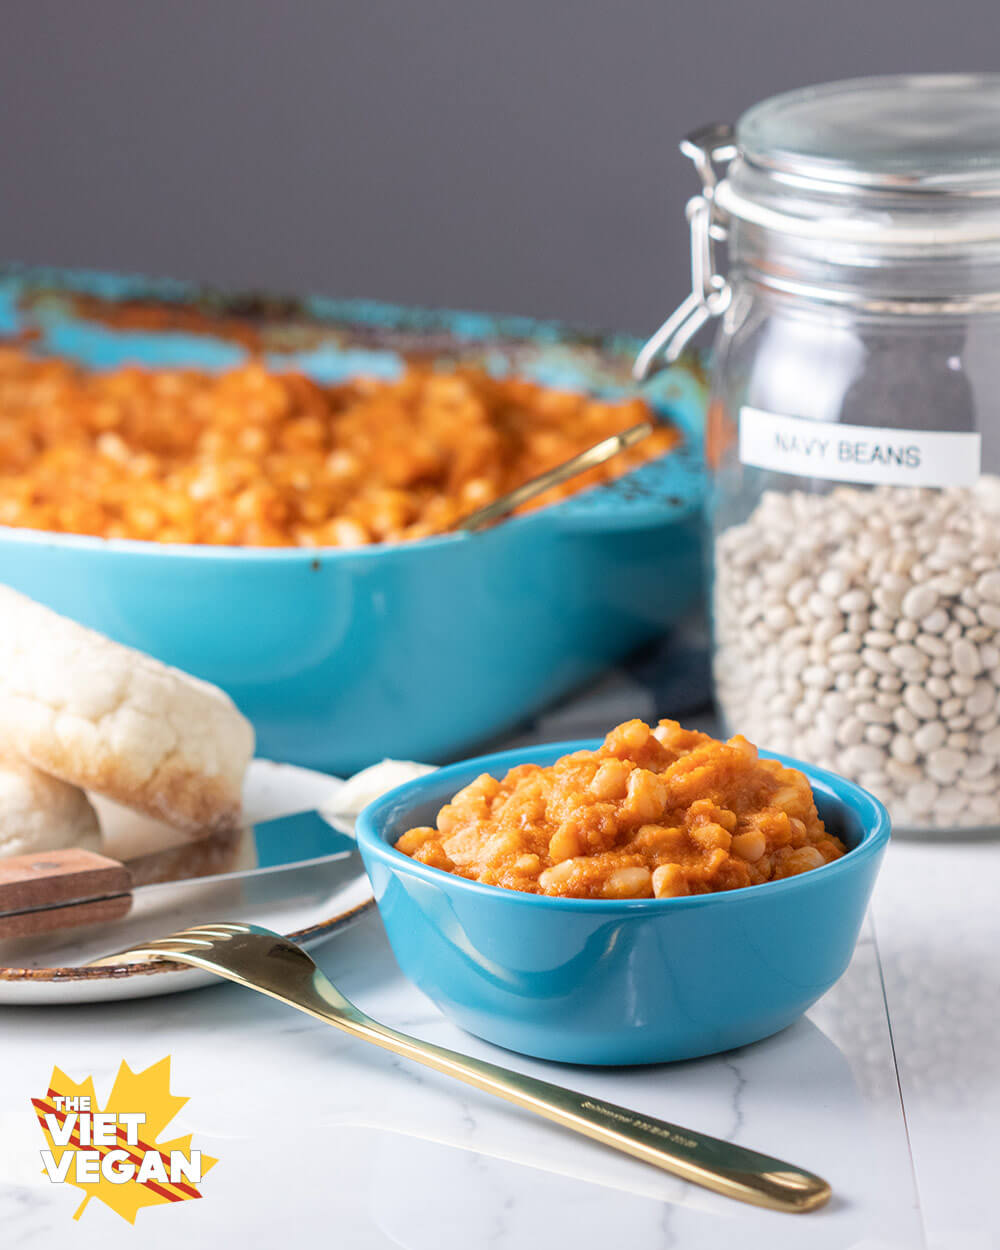 Vegan Baked Beans with Sneaky Veggies | The Viet Vegan